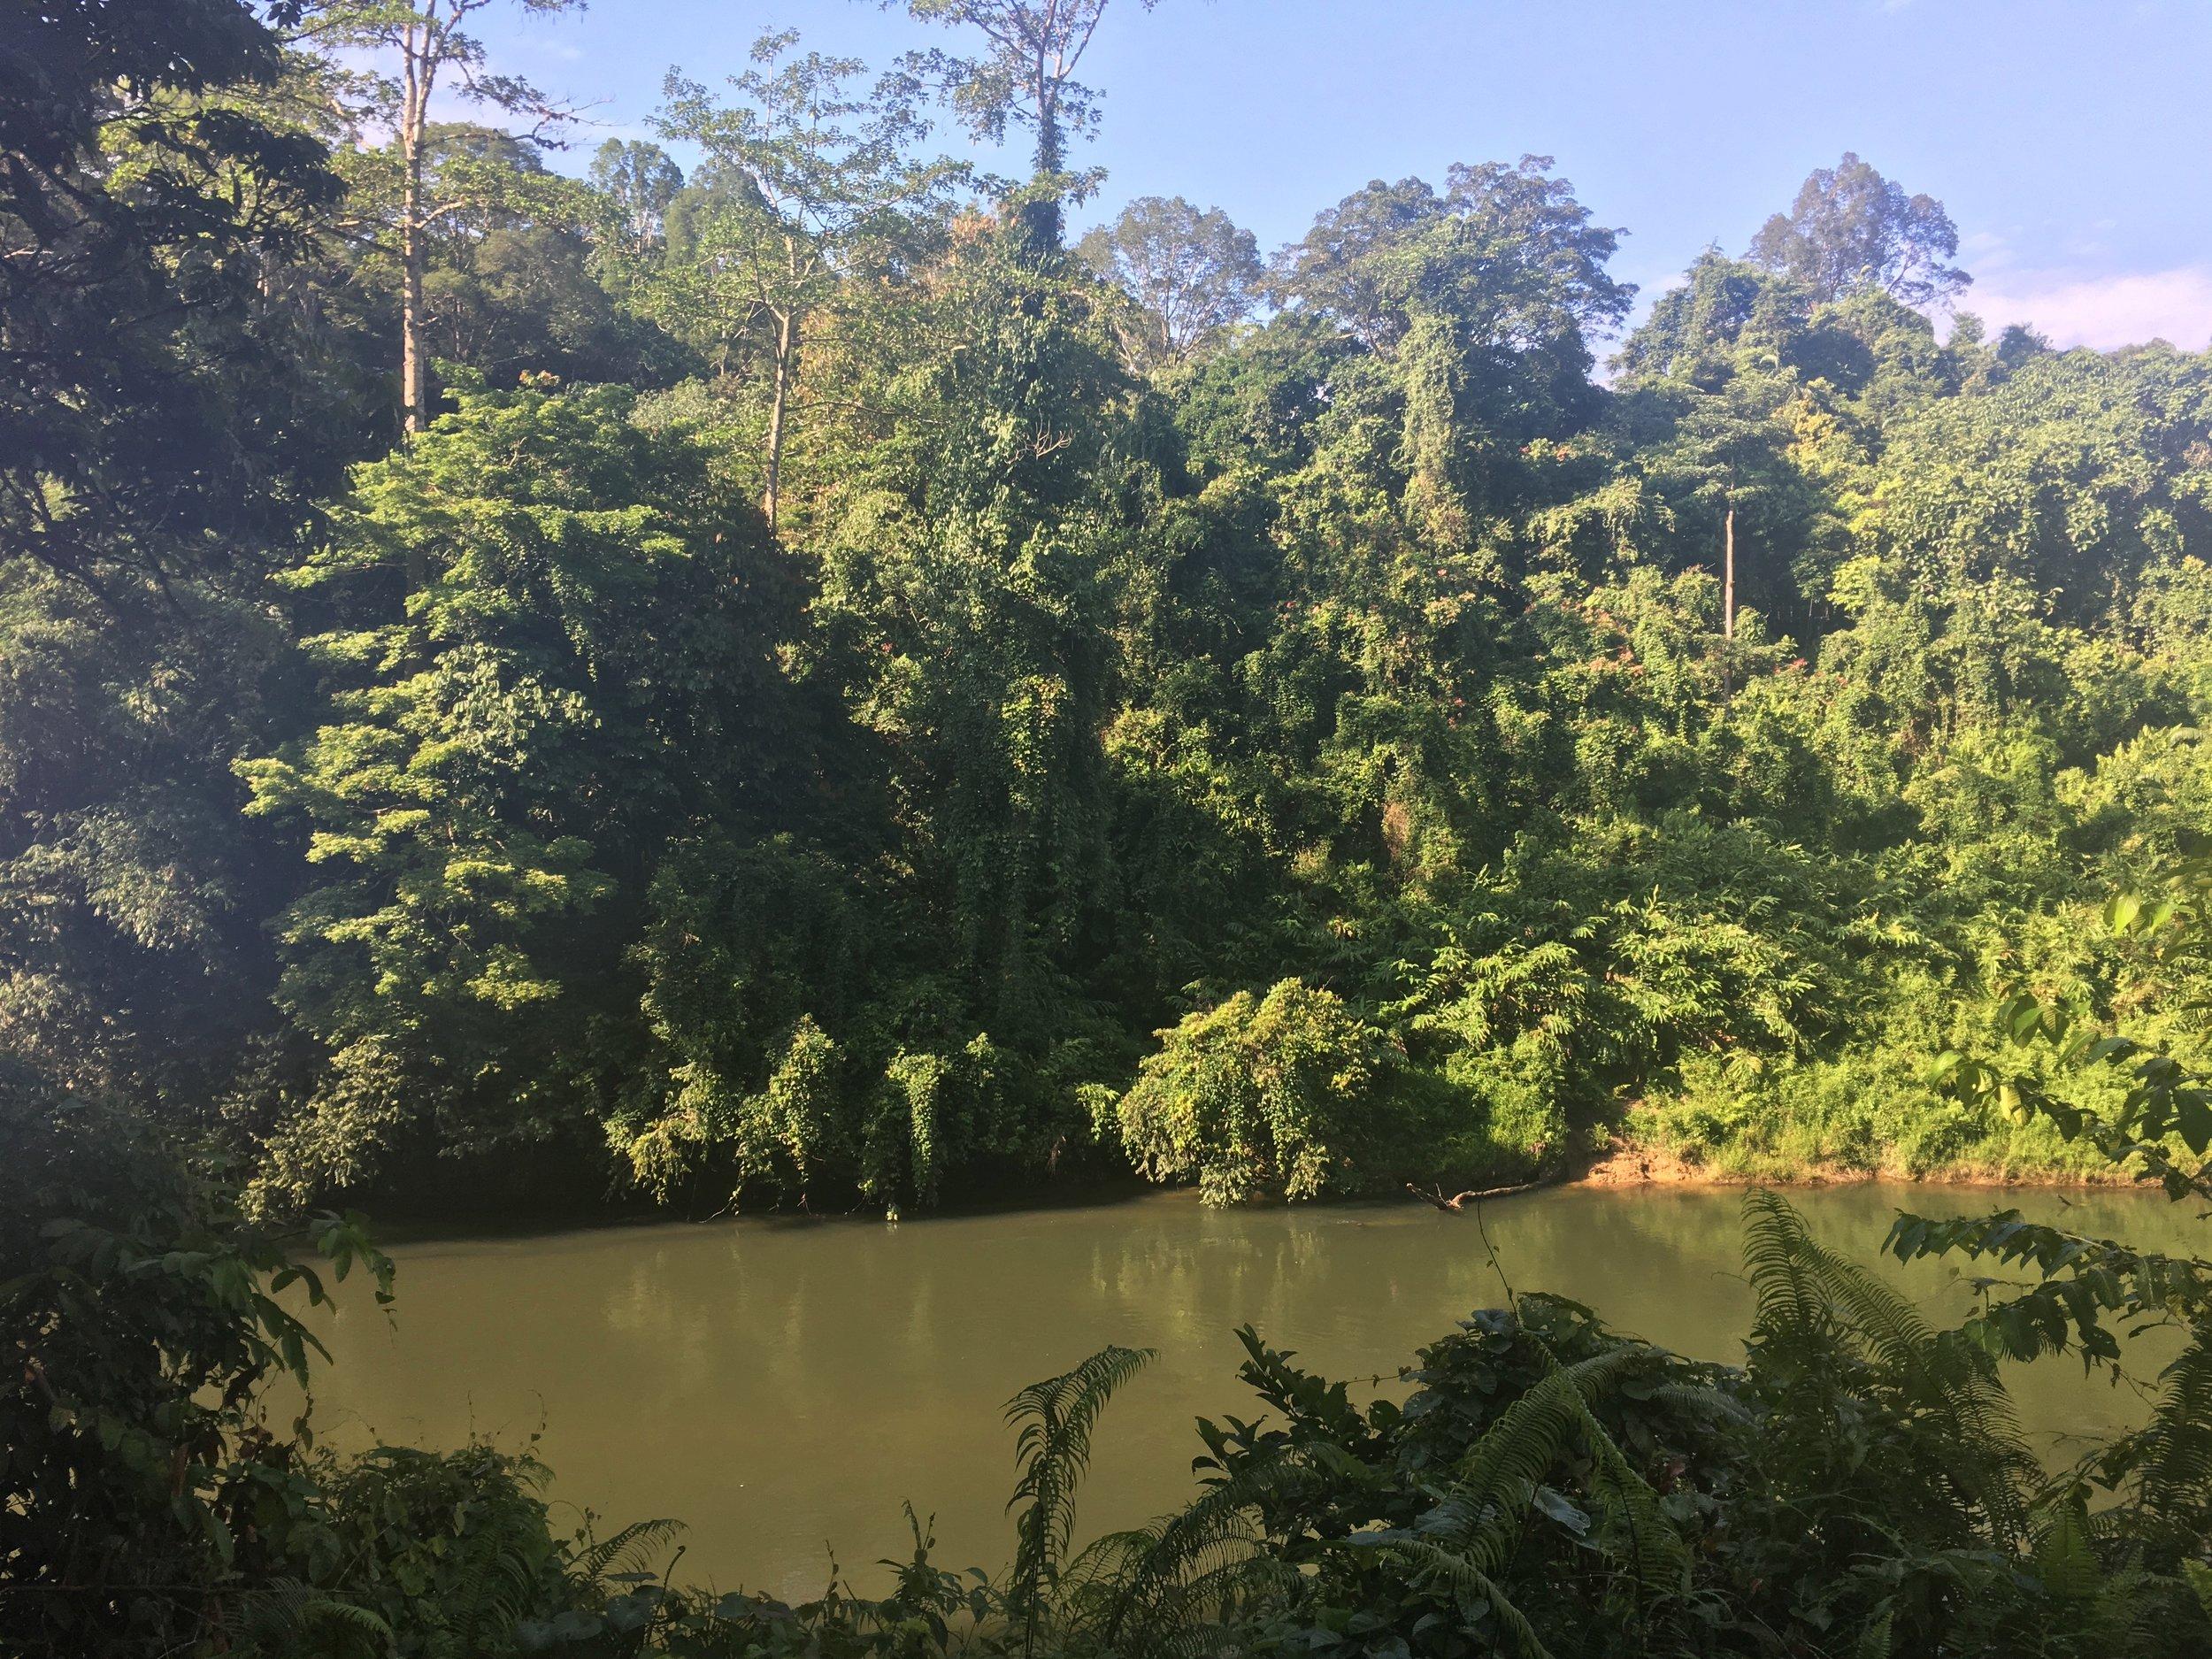 Lanjak Entimau Wildlife Sanctuary in Sarawak, Borneo.